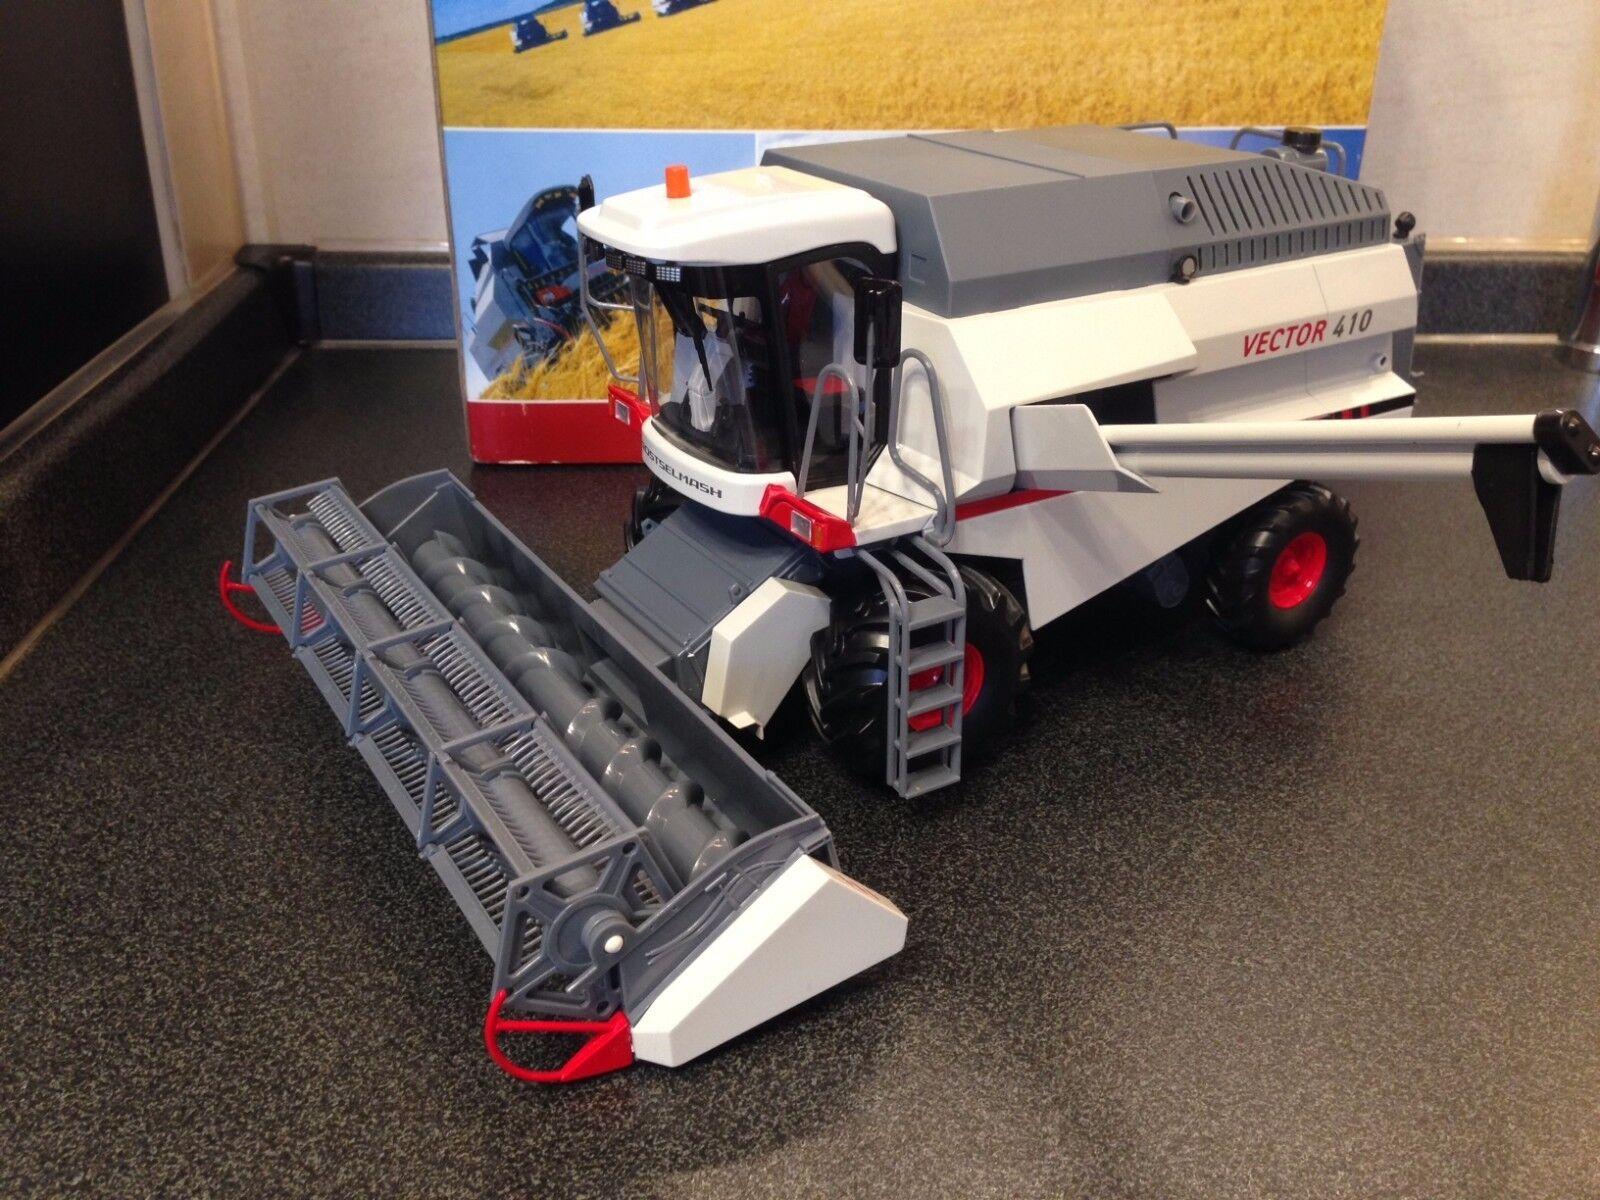 1 32 Rostselmash Vector 410  Combine Harvester  Mähdrescher  Moissonneuse SALE